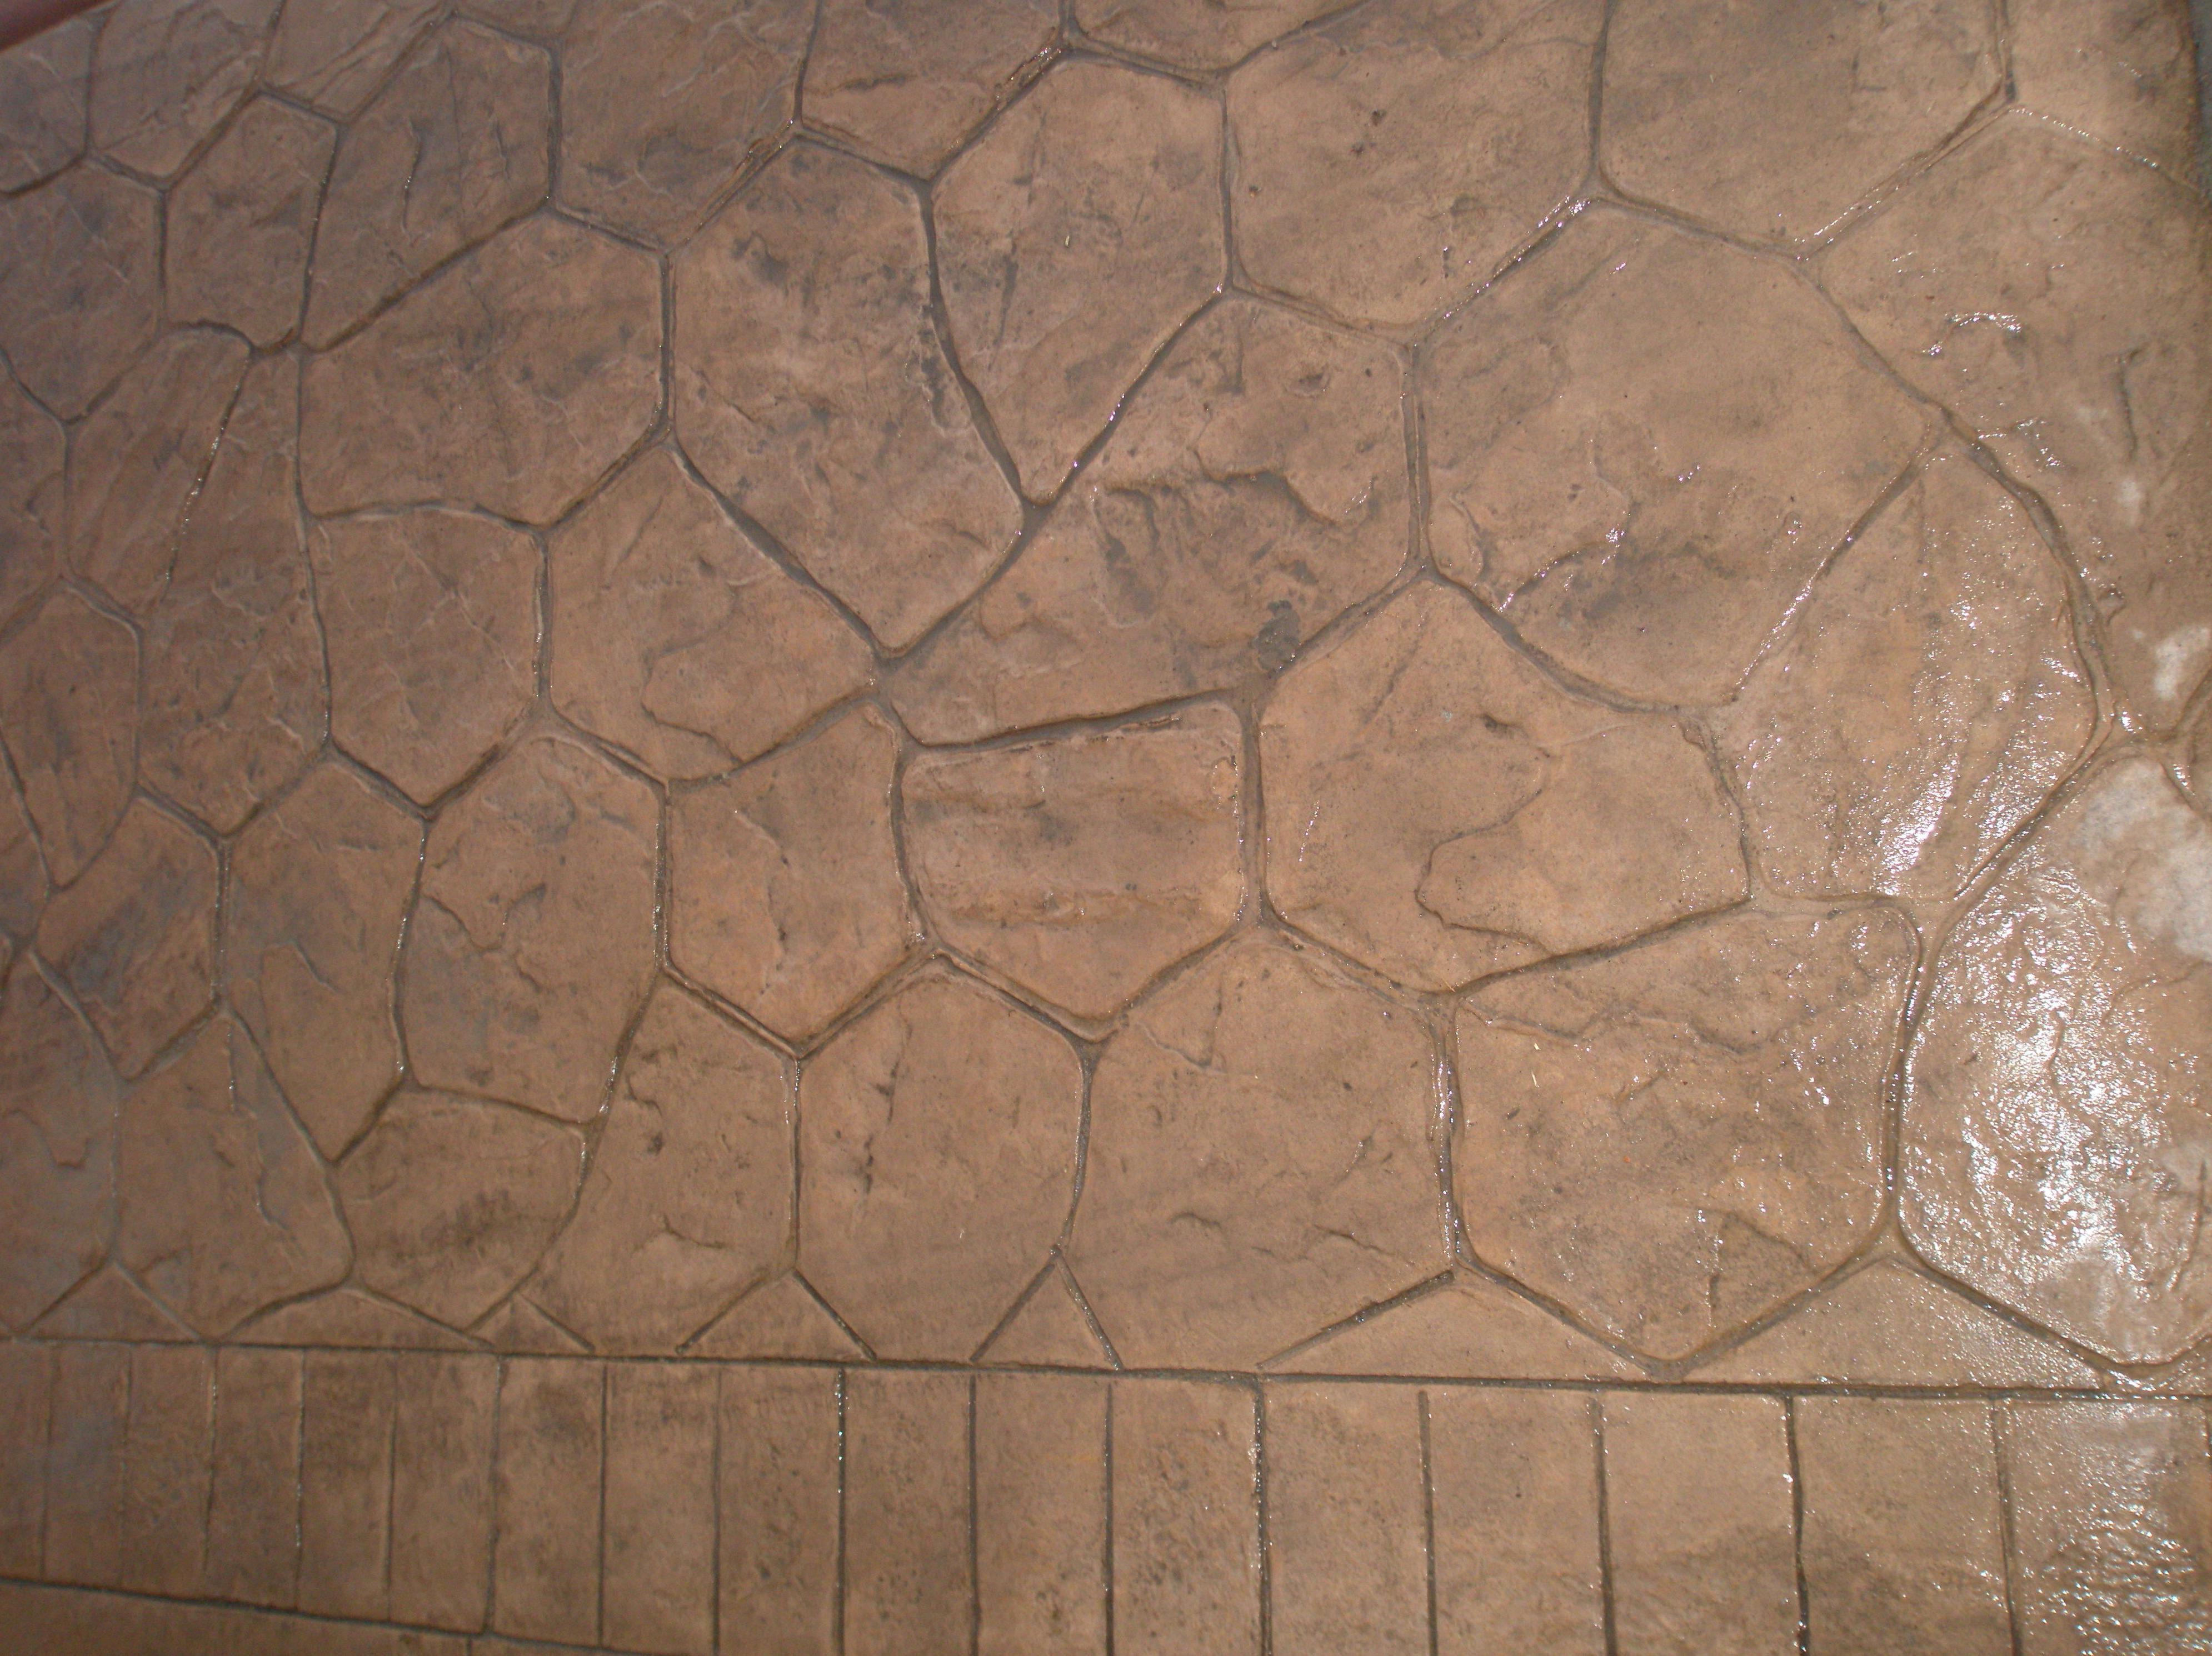 Foto 28 de Pavimentos industriales en Catarroja | Pavimentos Paterna, S.L.